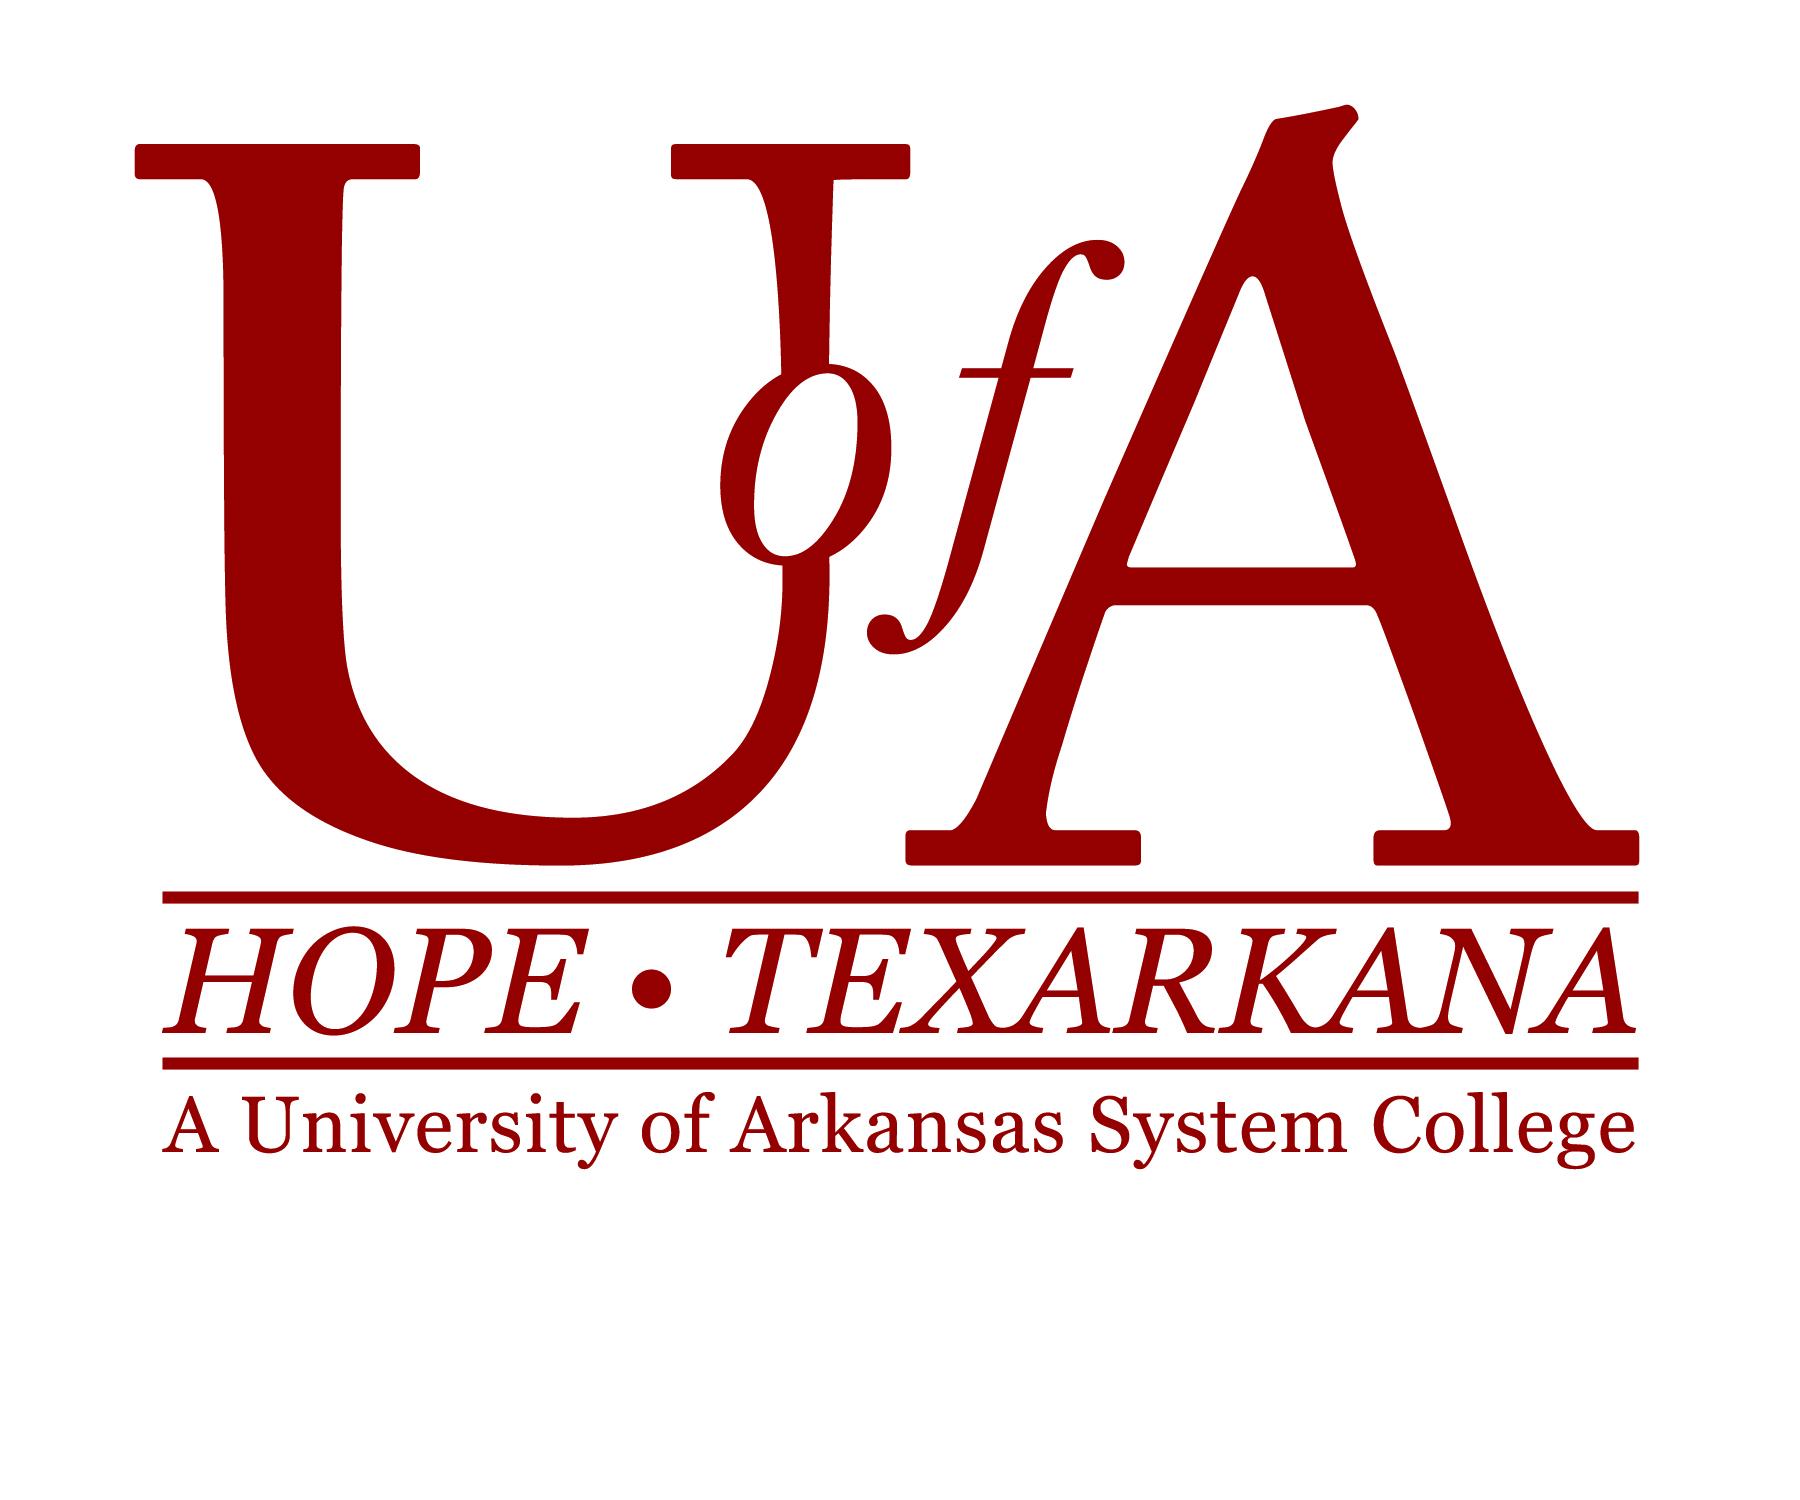 University of Arkansas Hope Texarkana - Department of Health Professions and NursingP.O .Box 140Hope, AR 71801Phone: 870-722-8235Fax: 870.722.8511